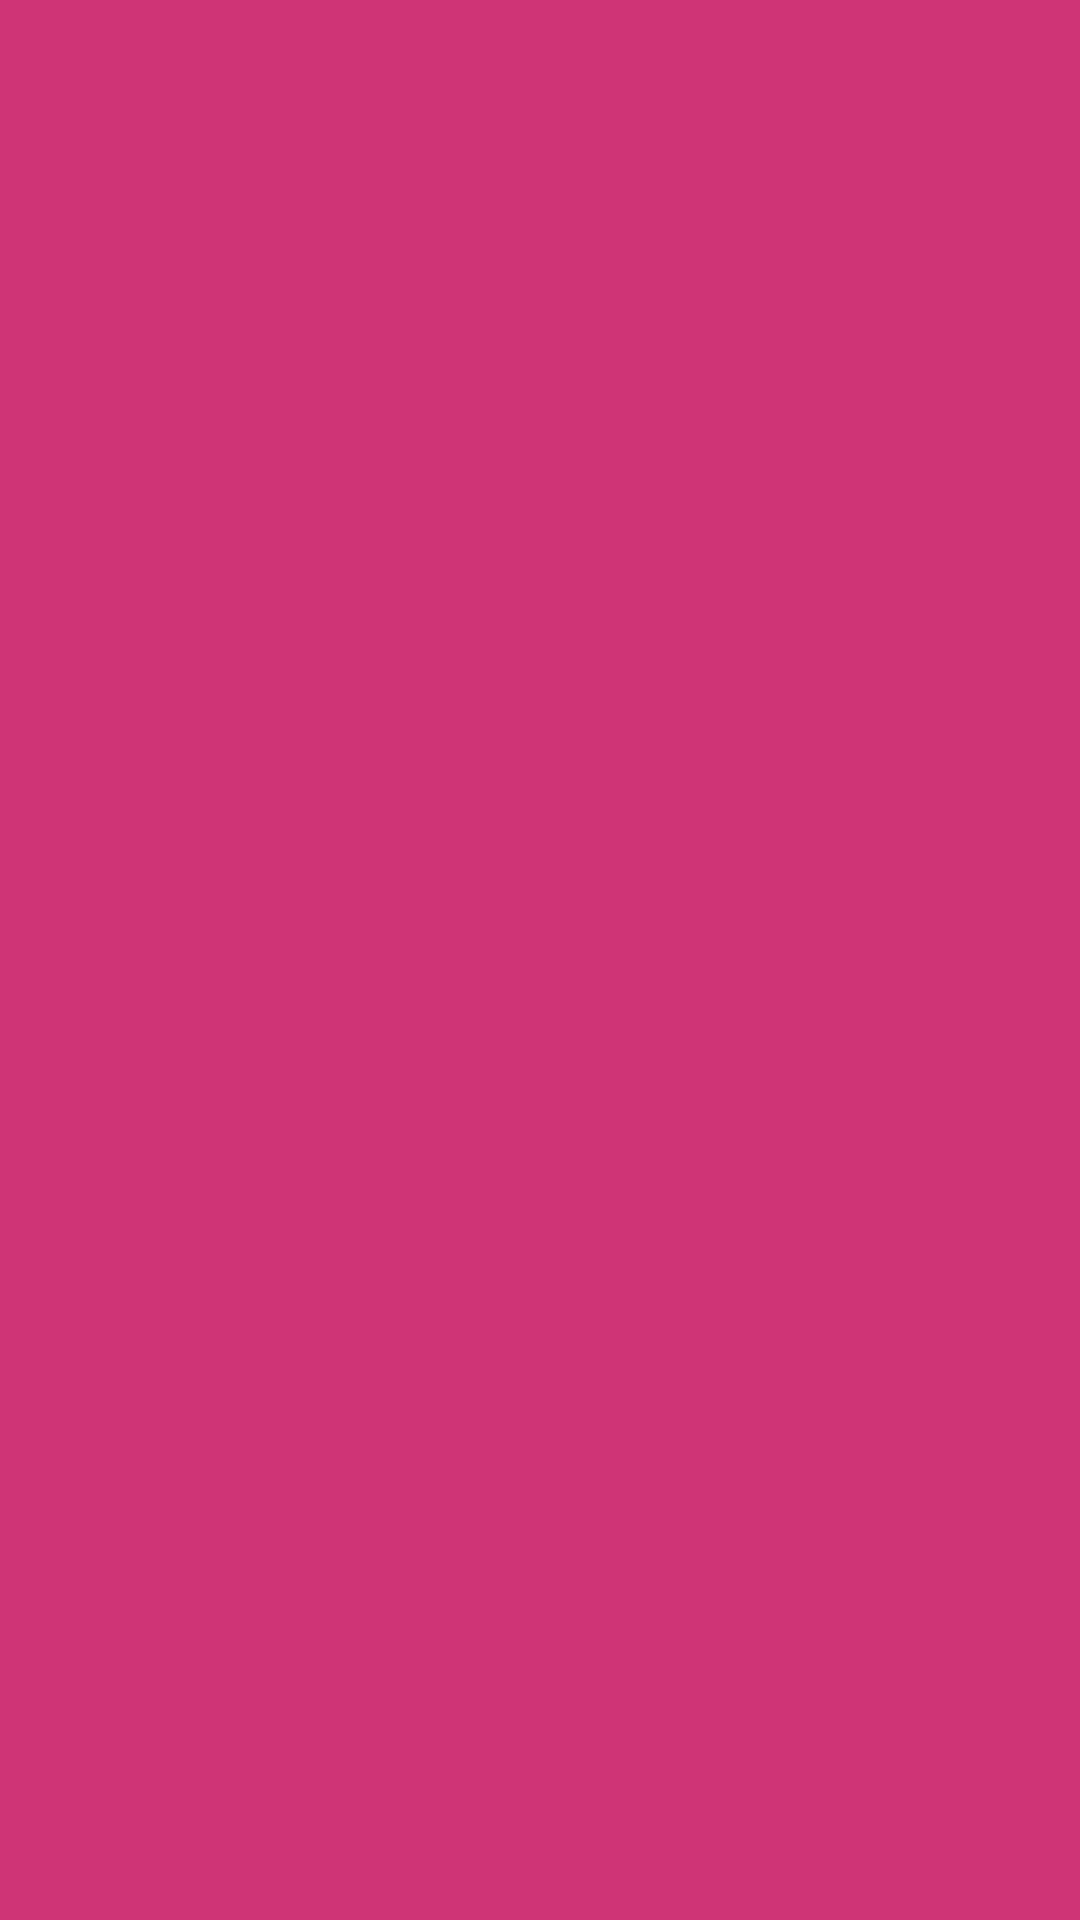 1080x1920 Telemagenta Solid Color Background